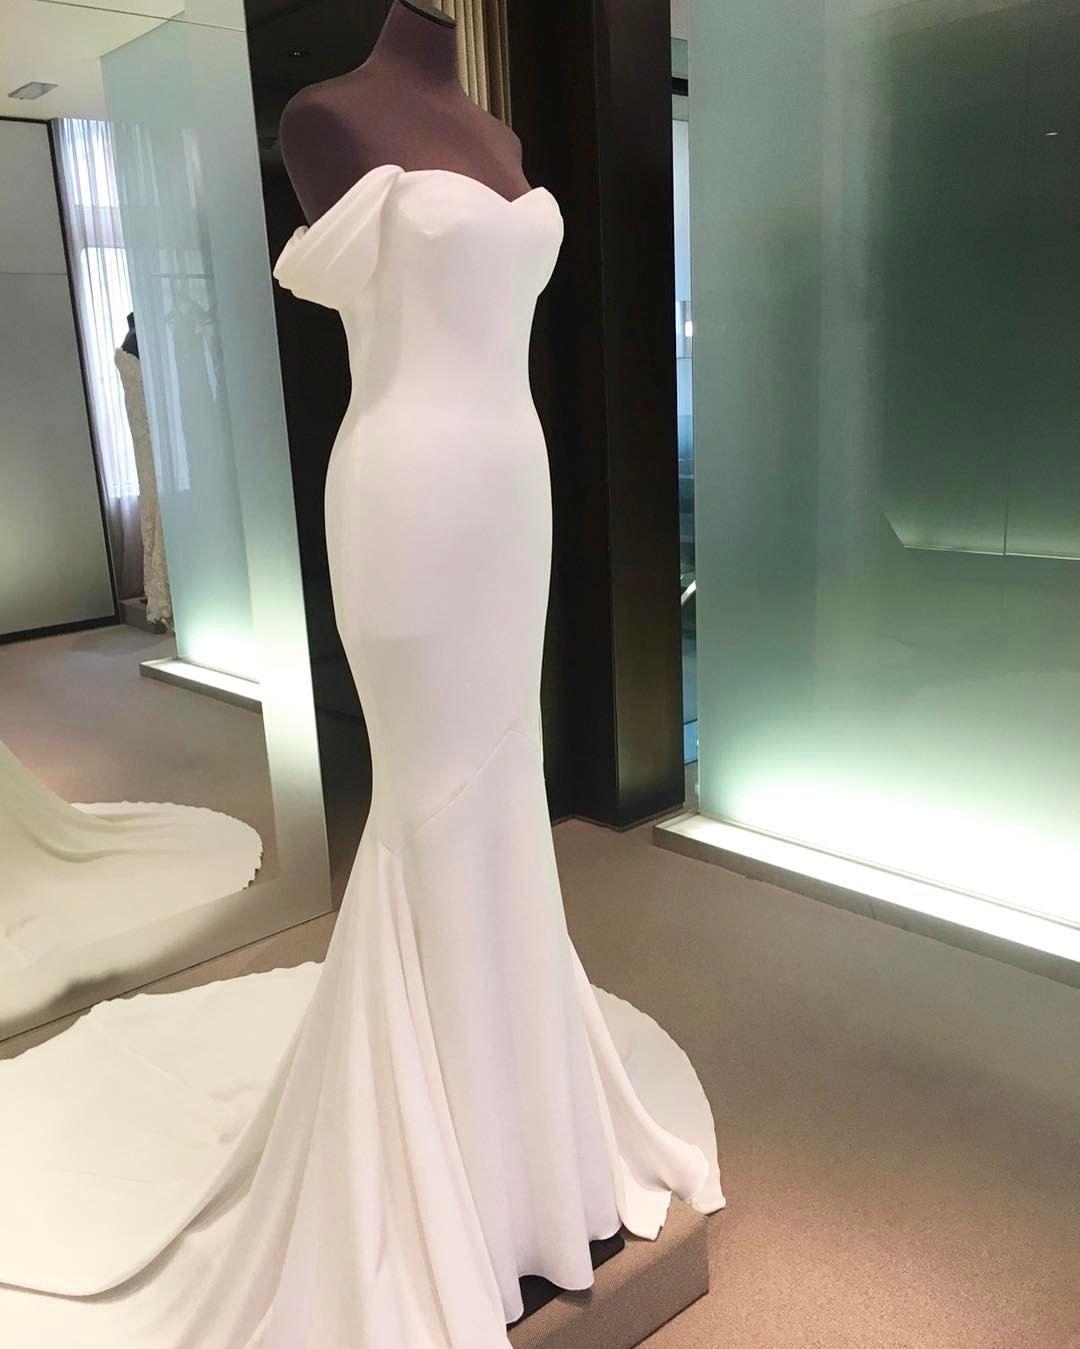 29 The Best Mermaid Wedding Dresses - wedding dress #mermaiddress #weddingdress #weddinggowns